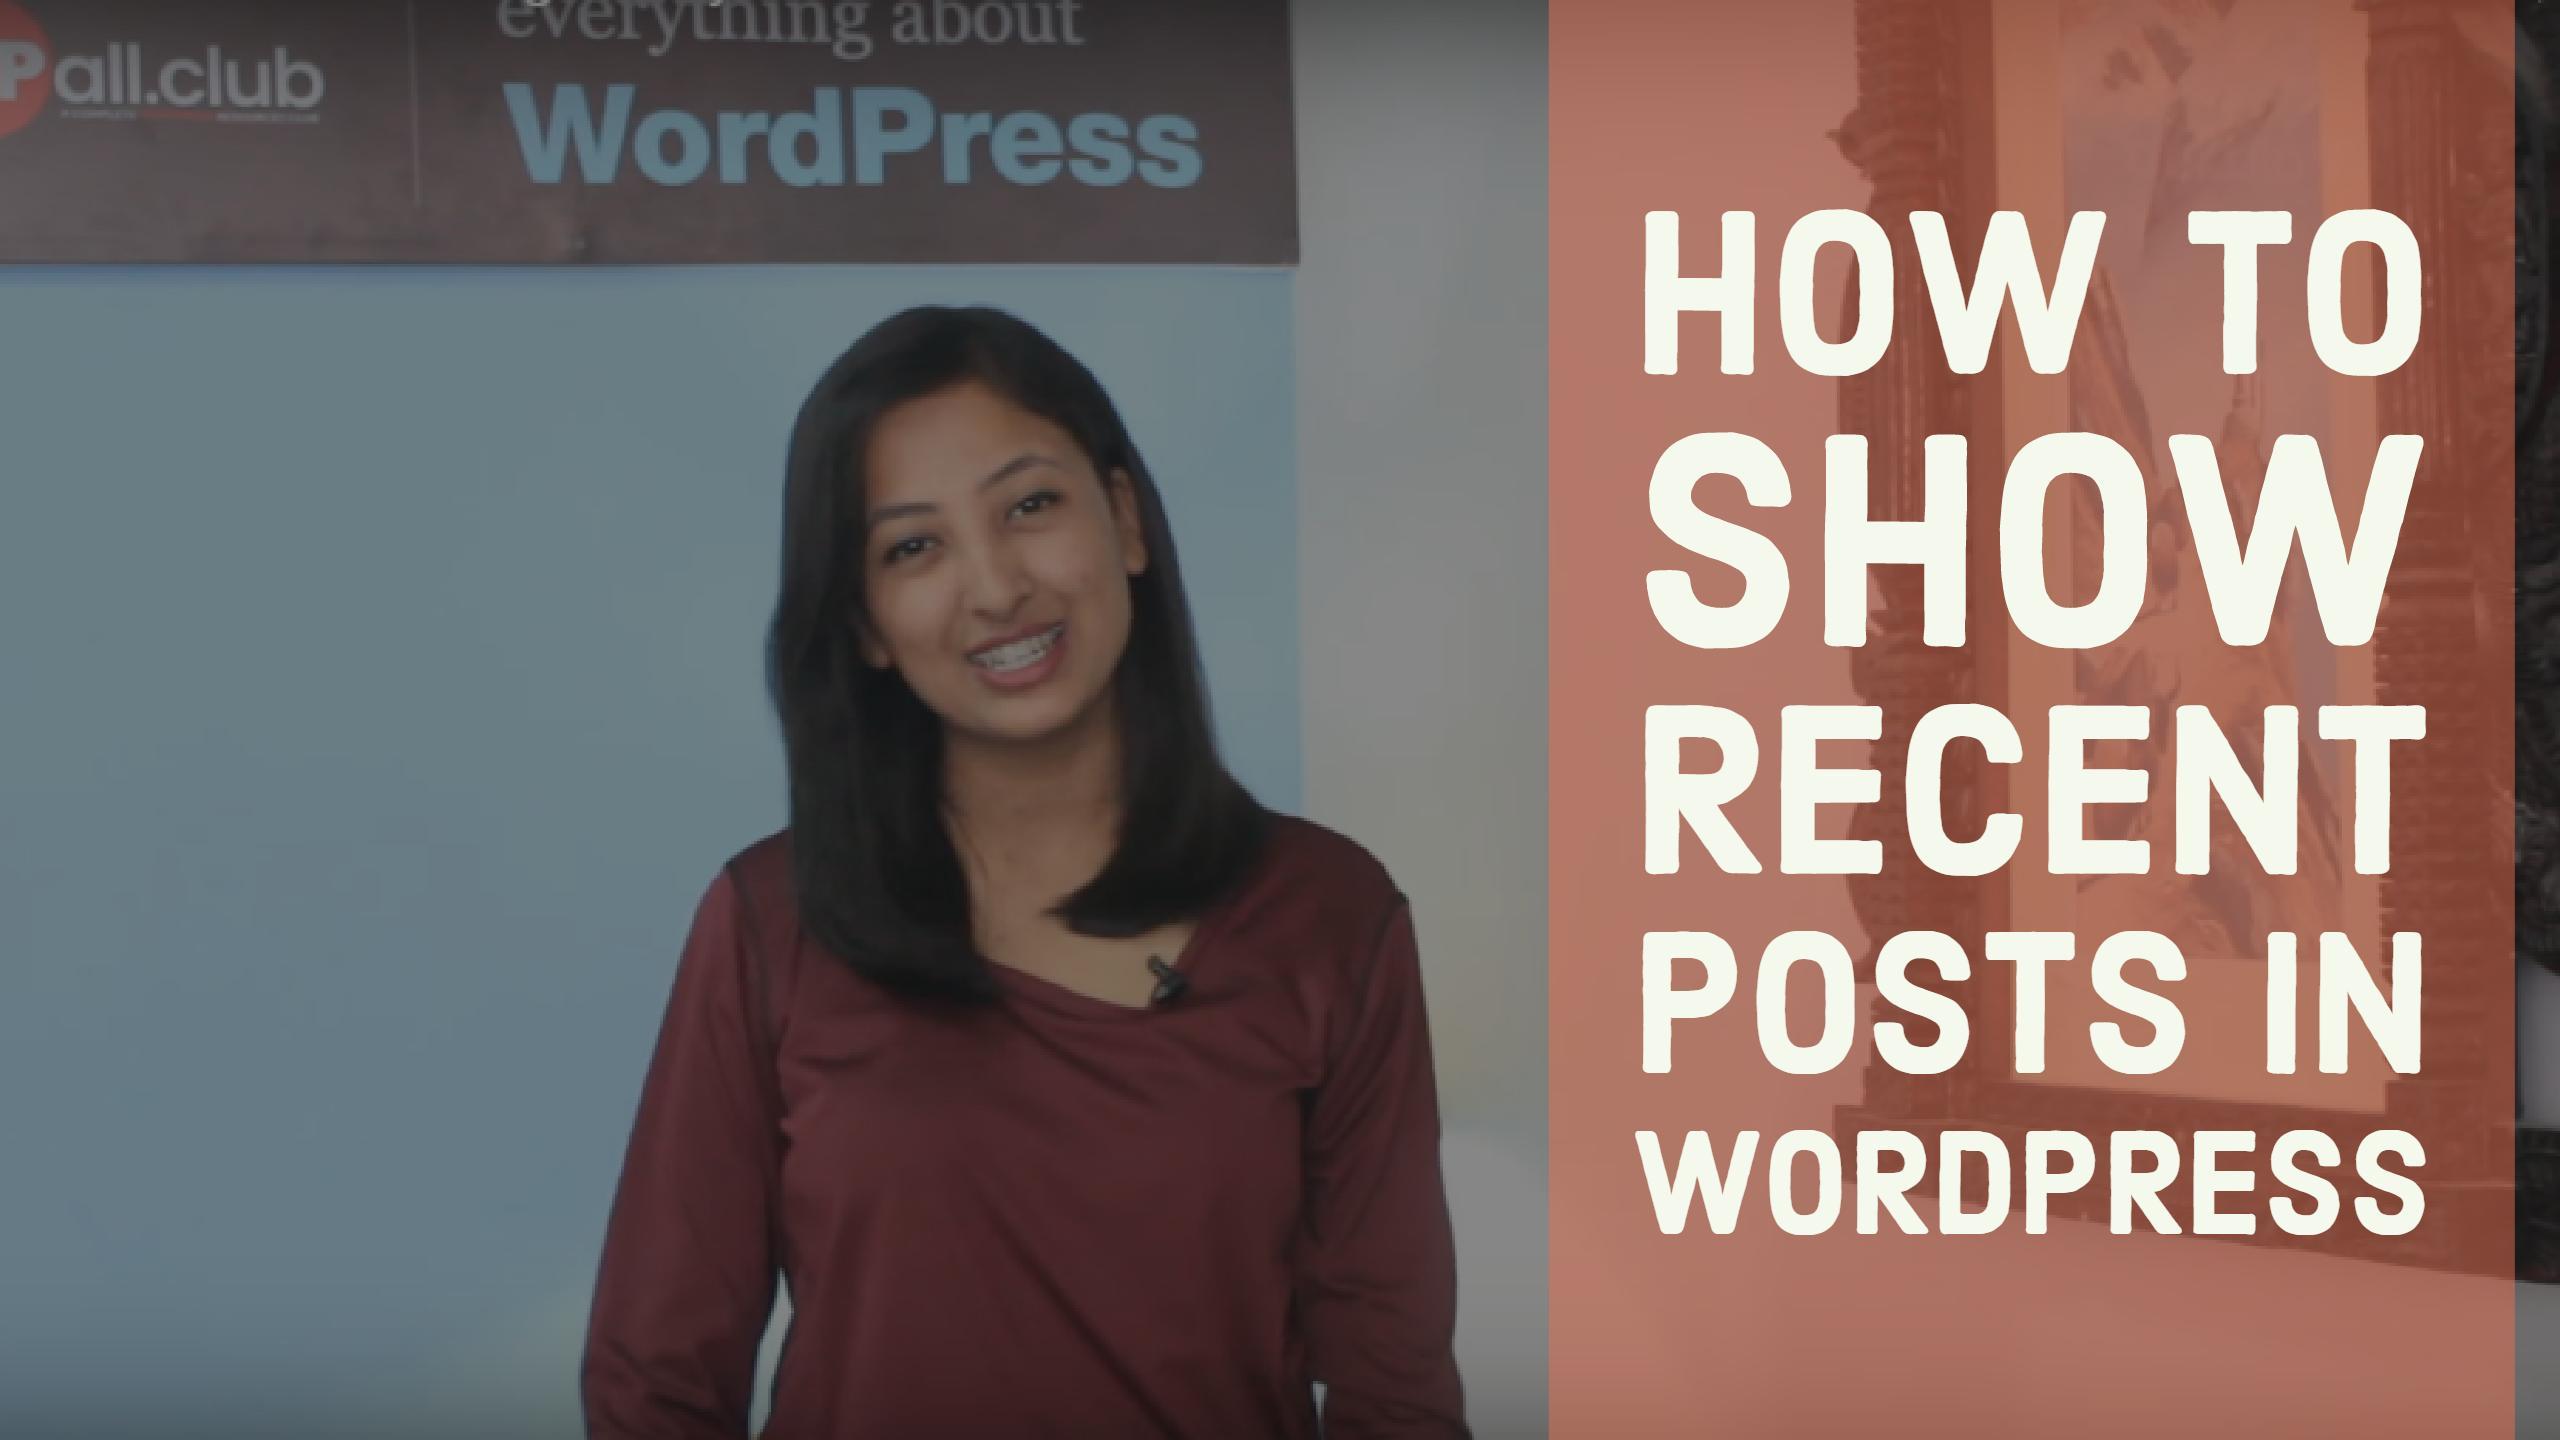 How to show recent posts in WordPress